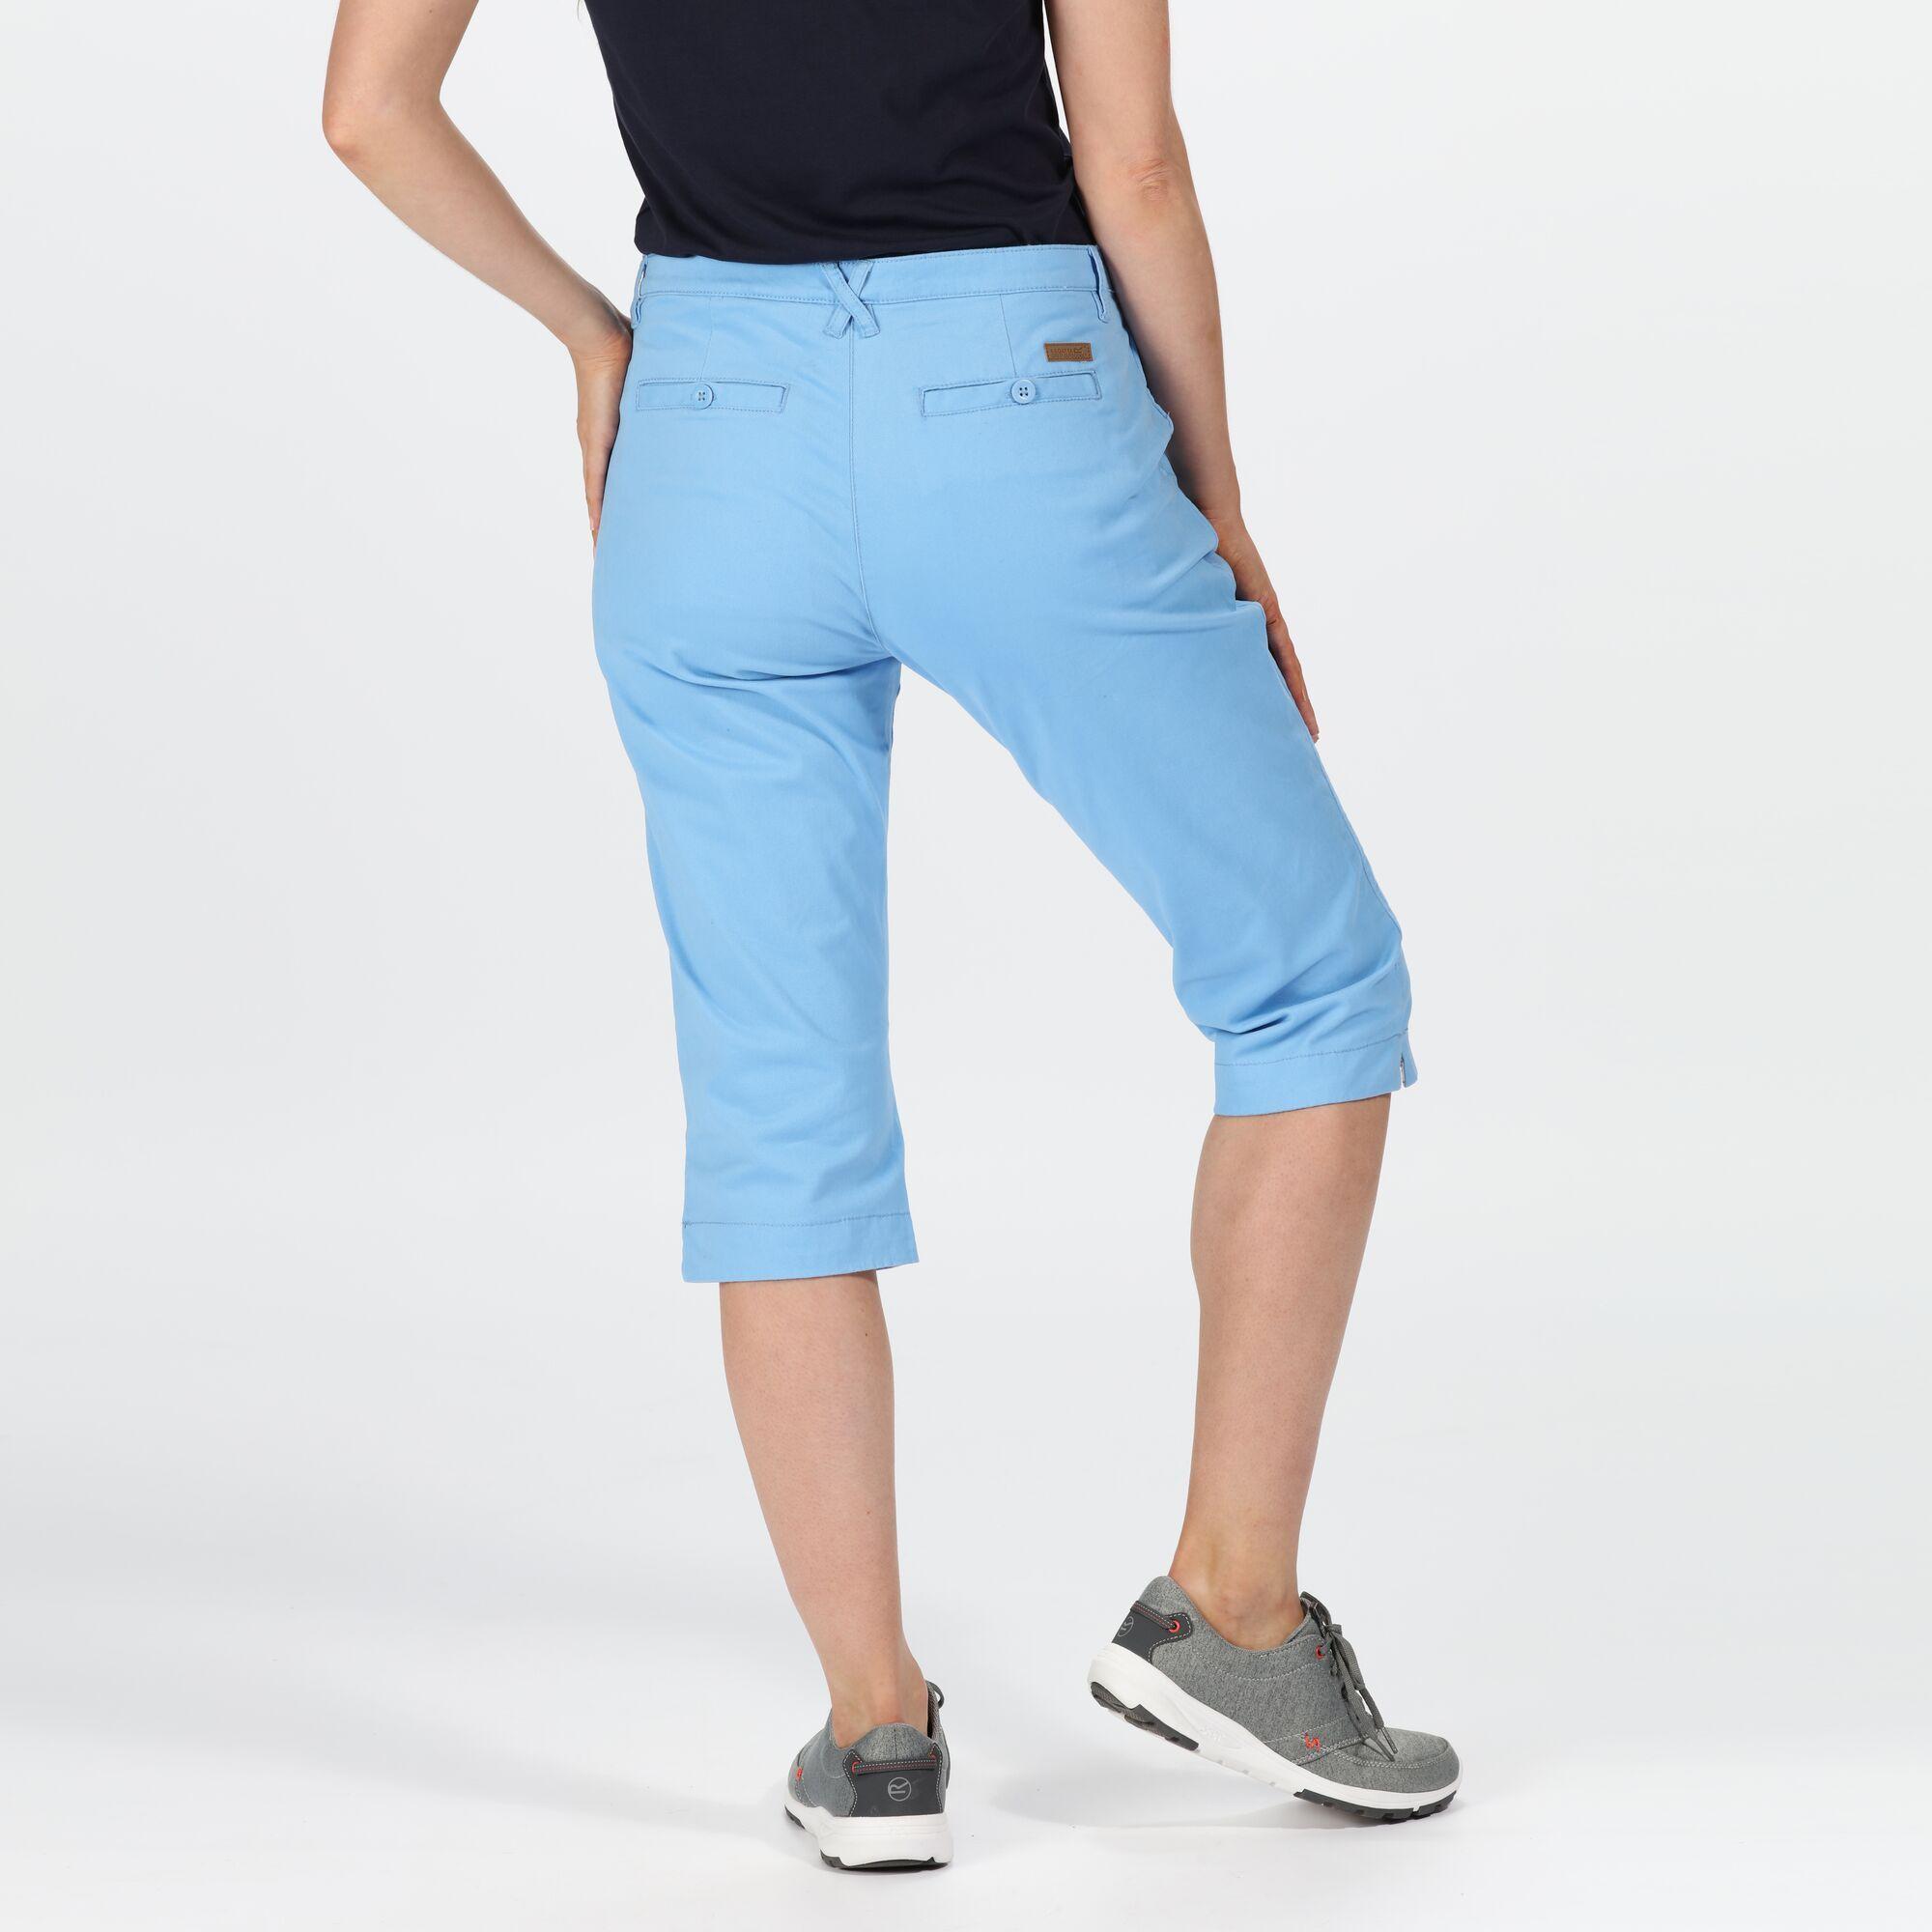 Regatta Womens/Ladies Maleena II Casual Capri Trousers